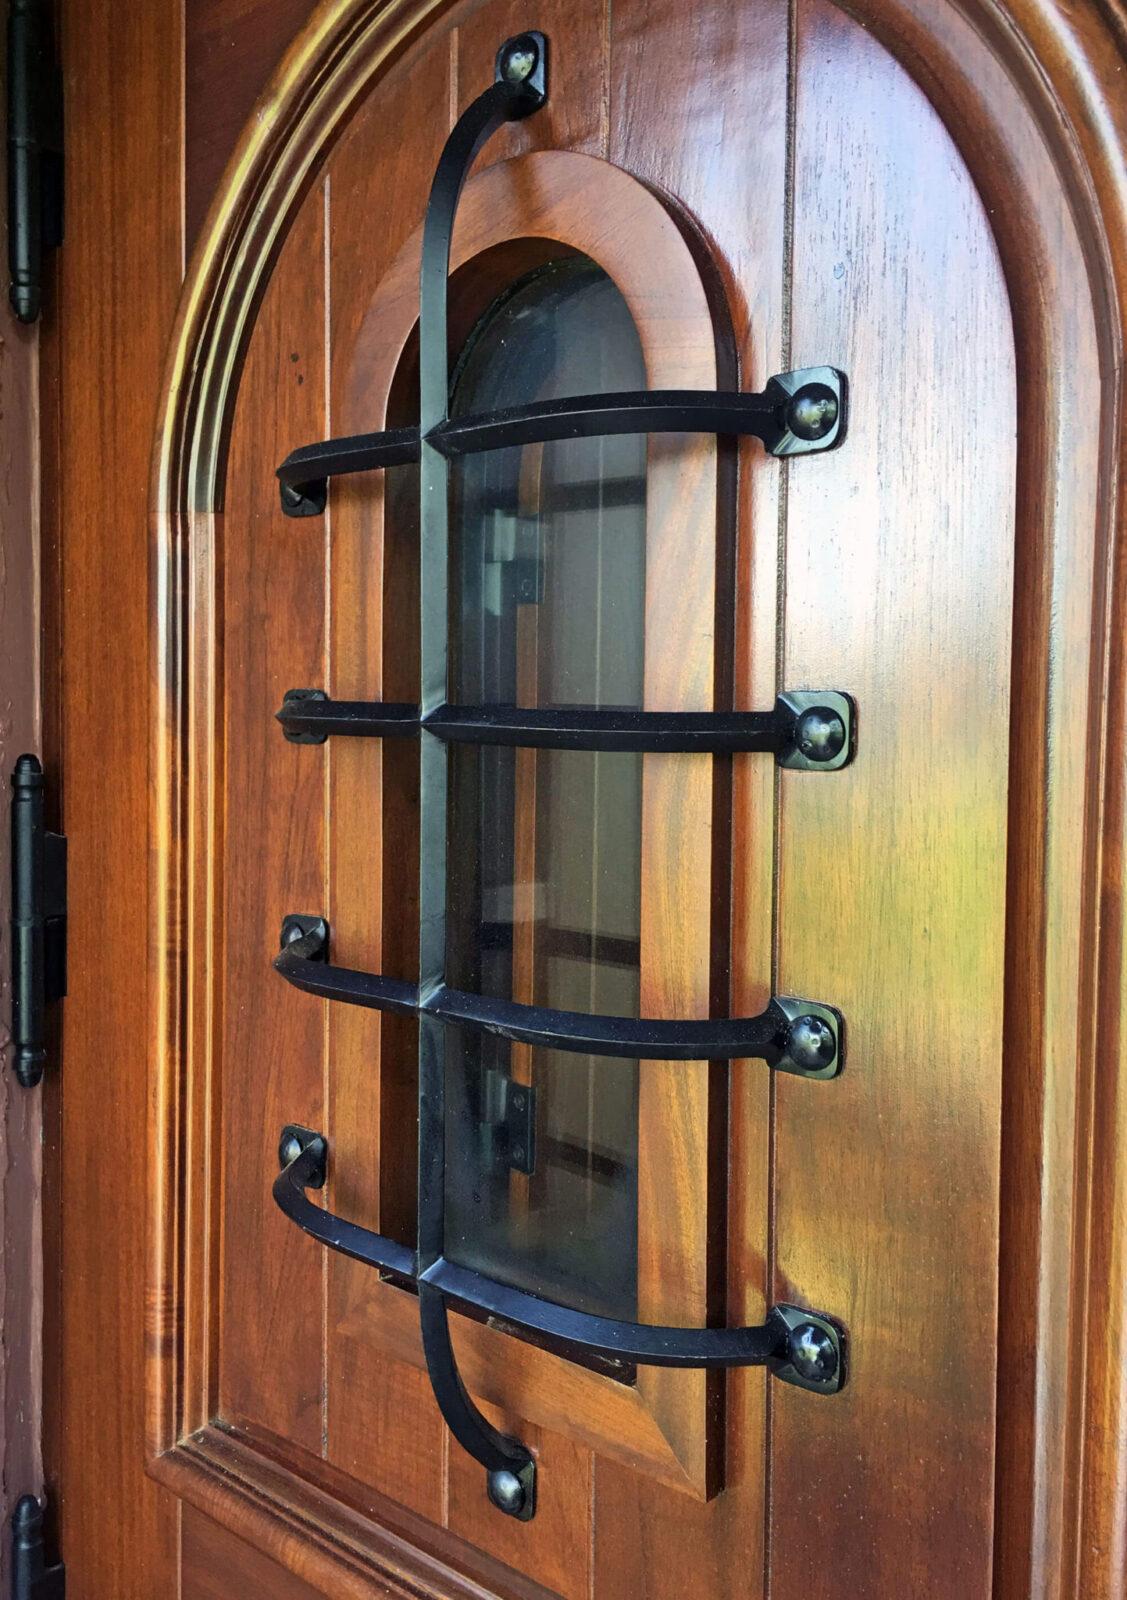 MALIBU MAHOGANY DOOR GRILL